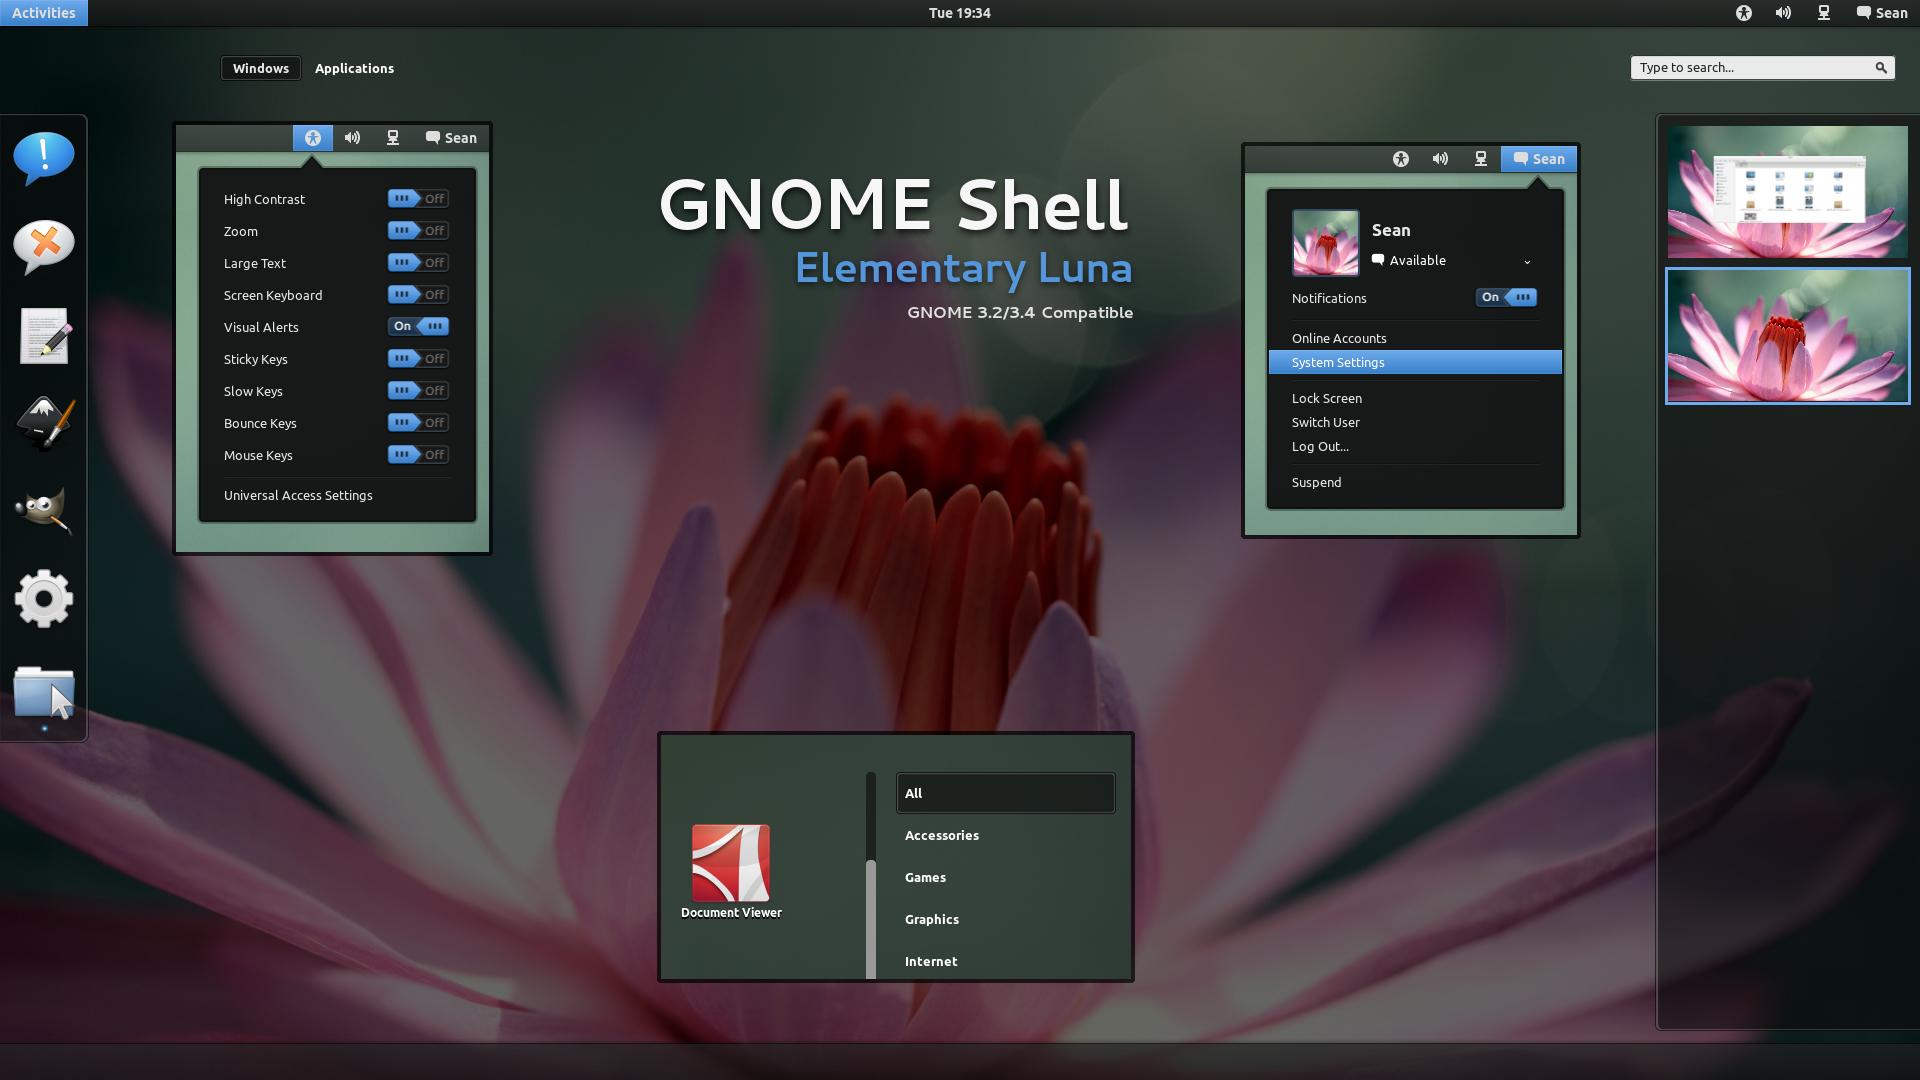 GNOME Shell - Elementary Luna